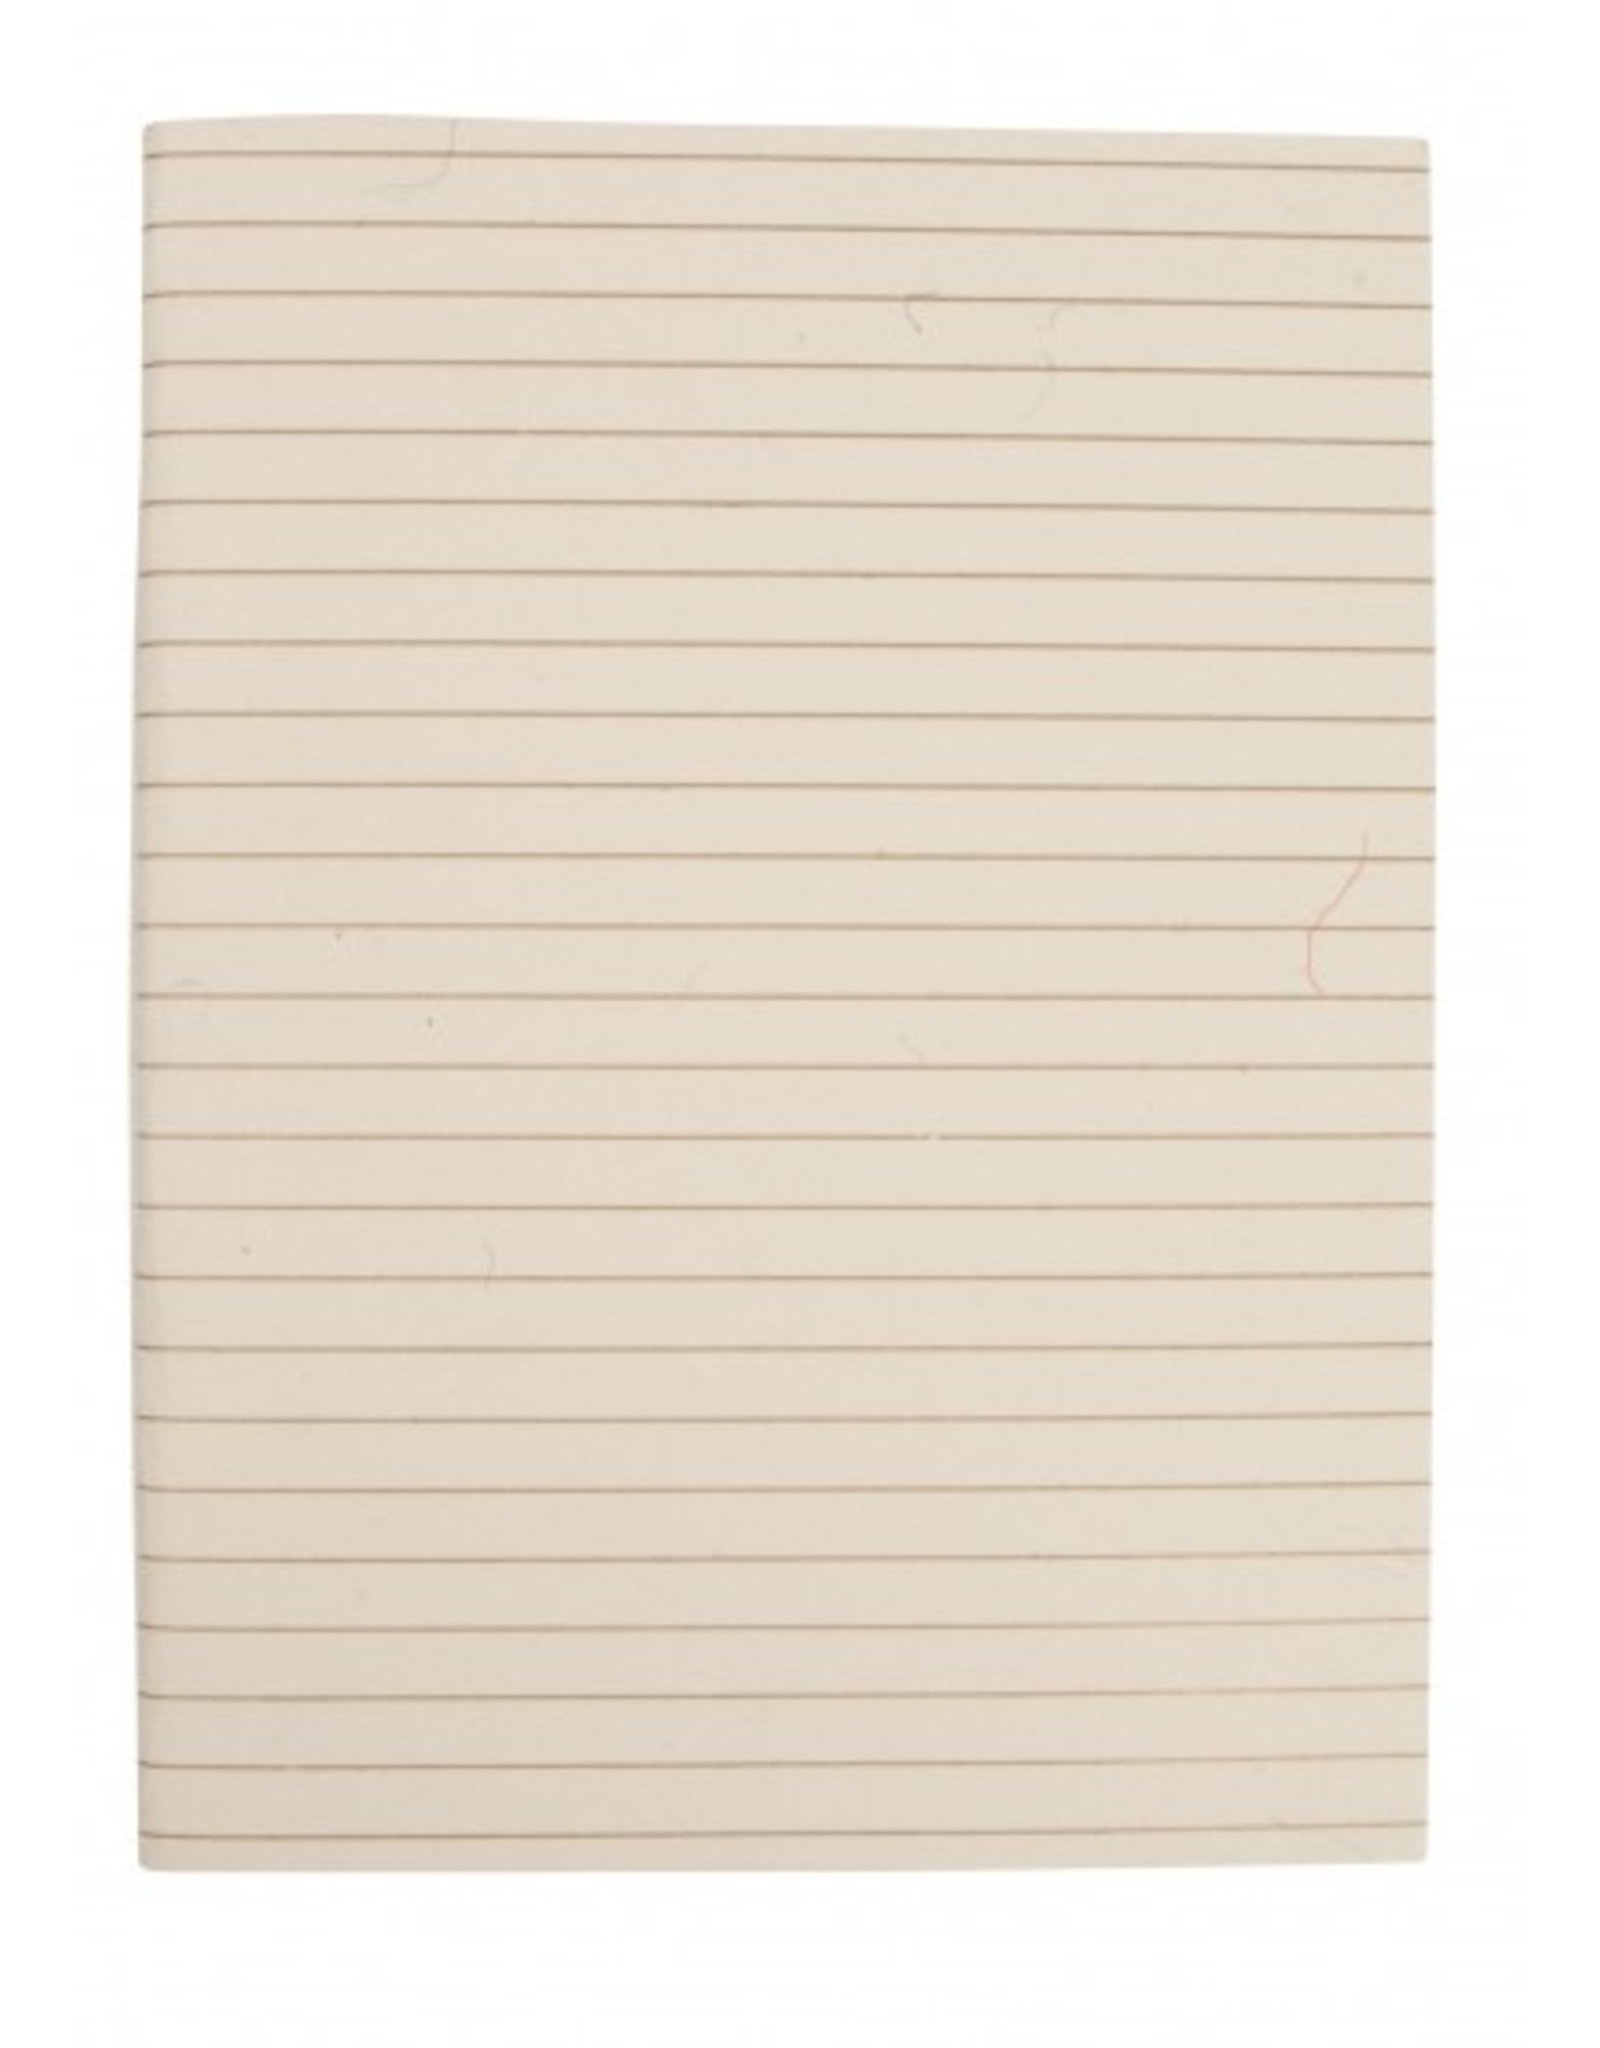 Lined Paper Journal Insert